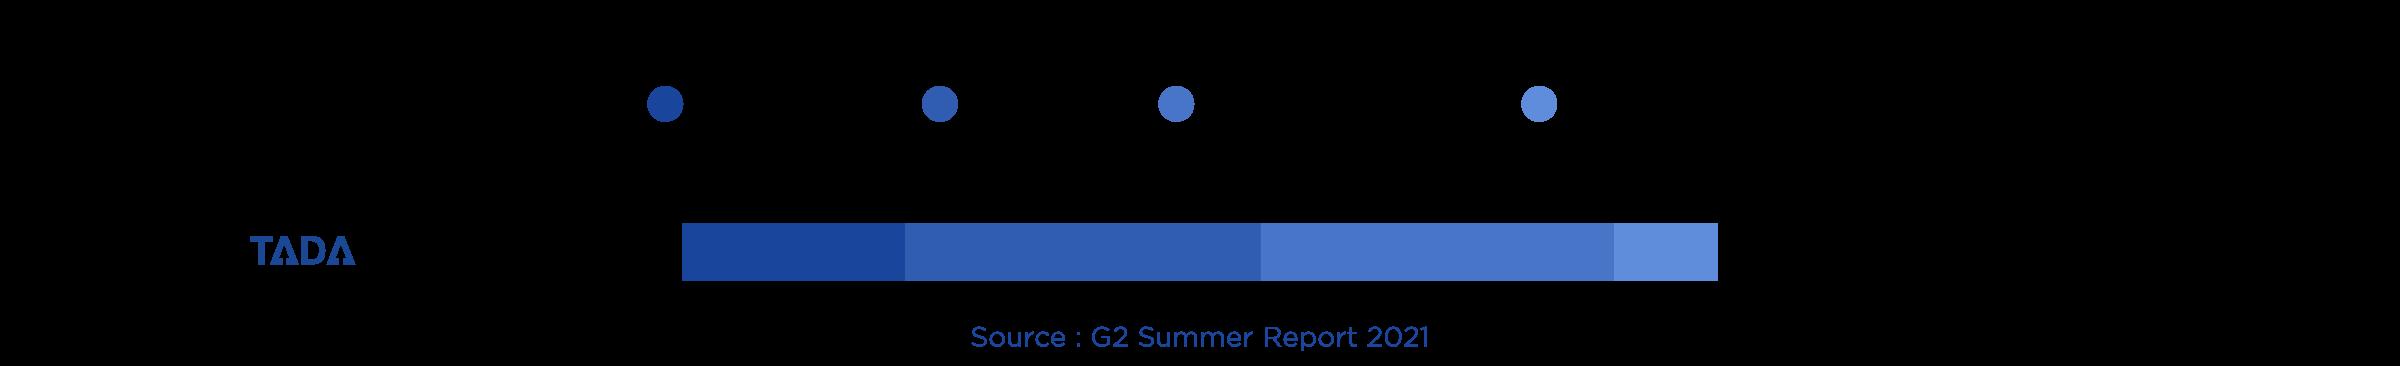 TADA G2 Usability index